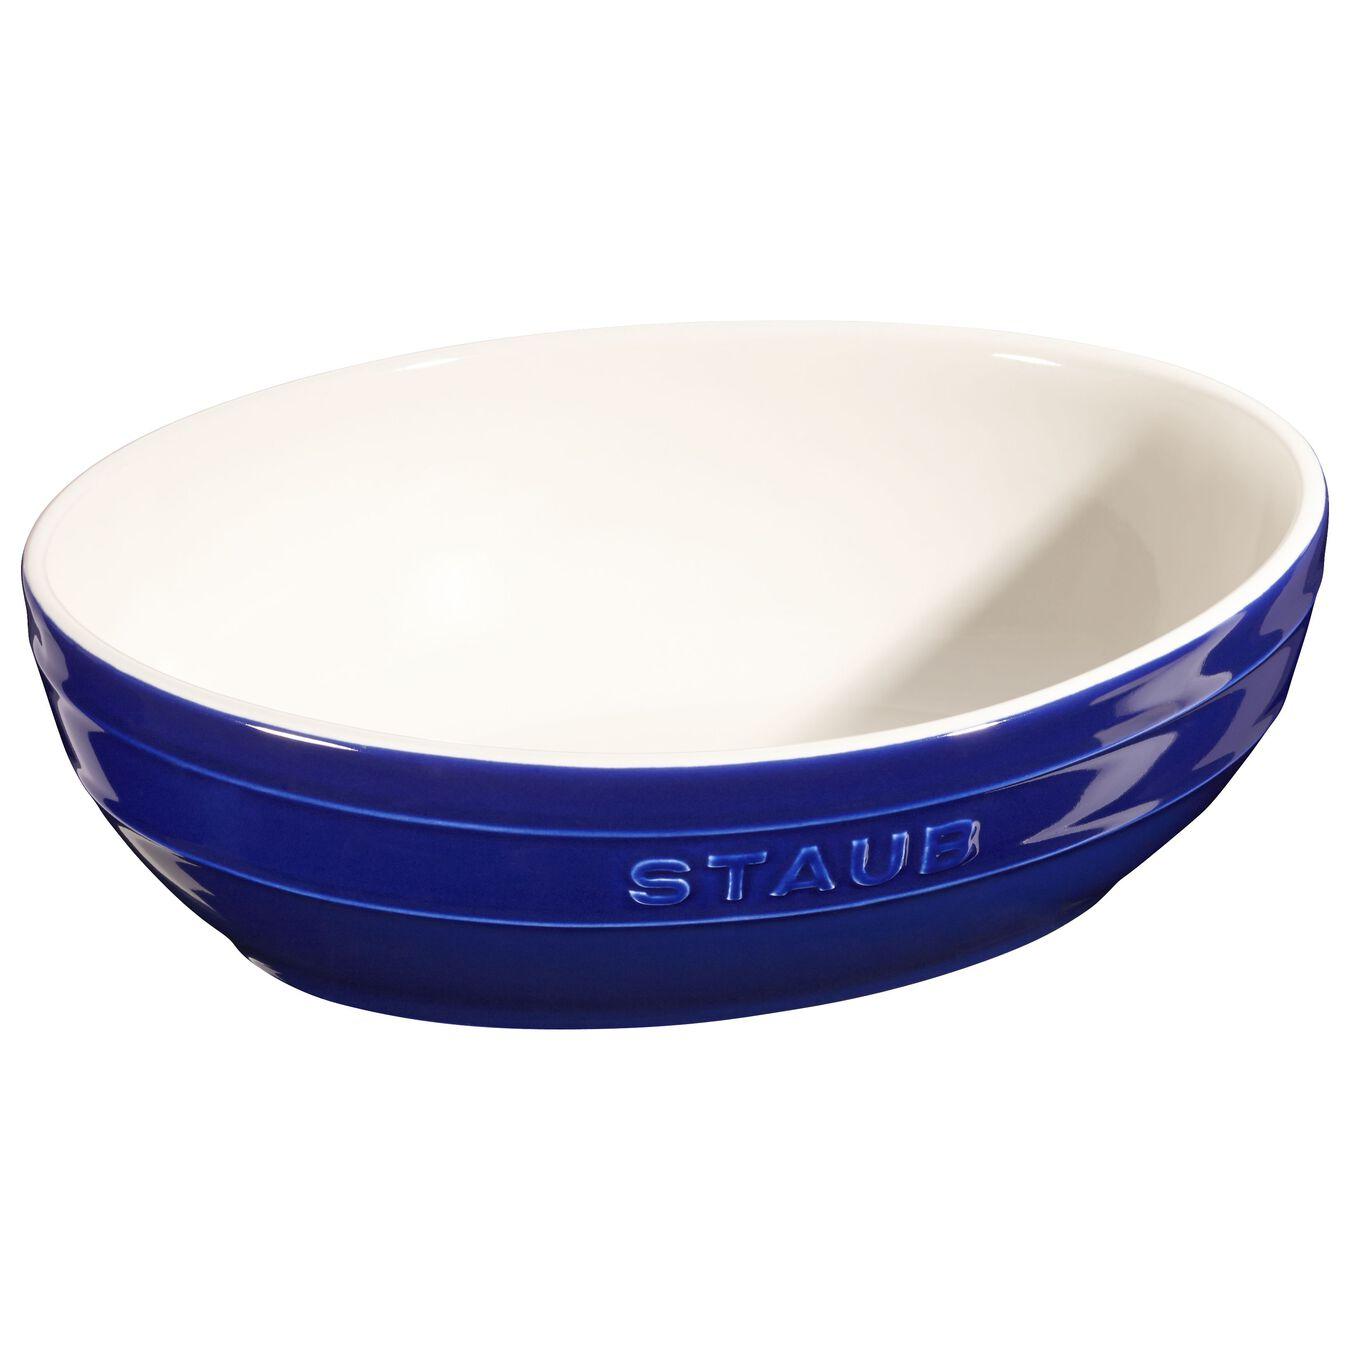 2 Piece oval Bowl set, dark-blue,,large 2